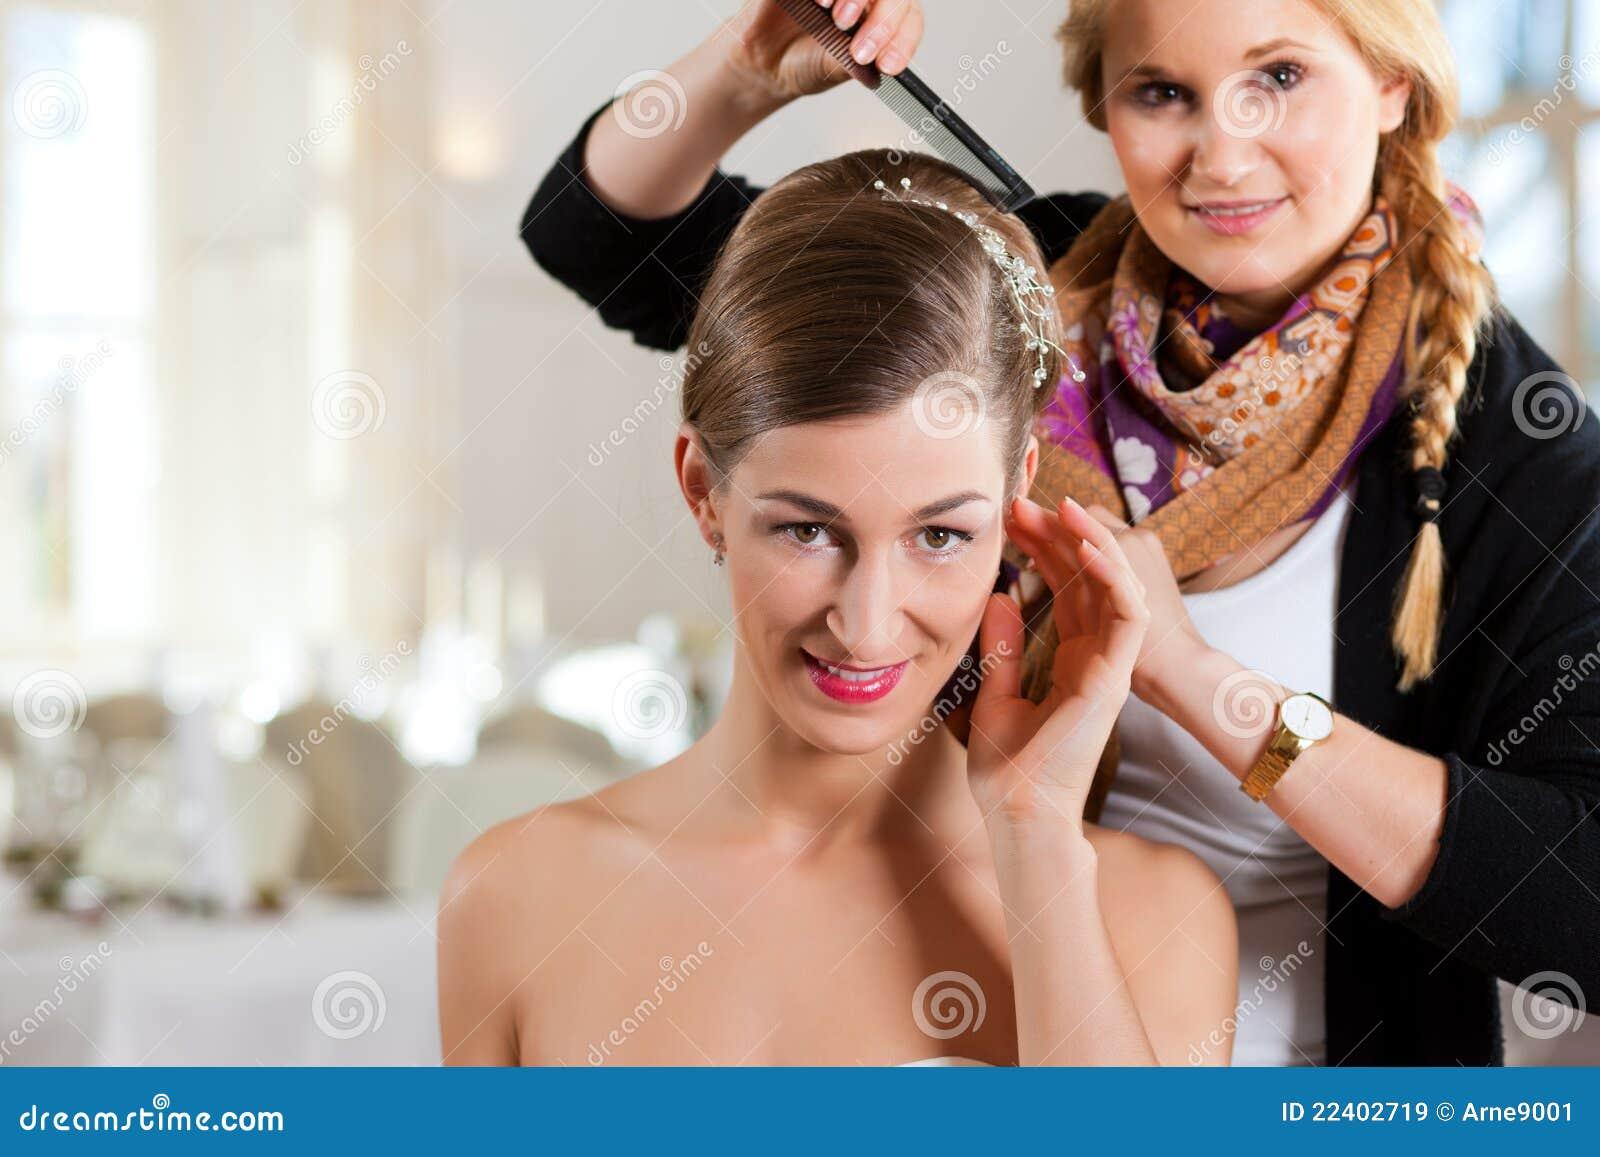 Stilist die het kapsel van een bruid vastmaakt